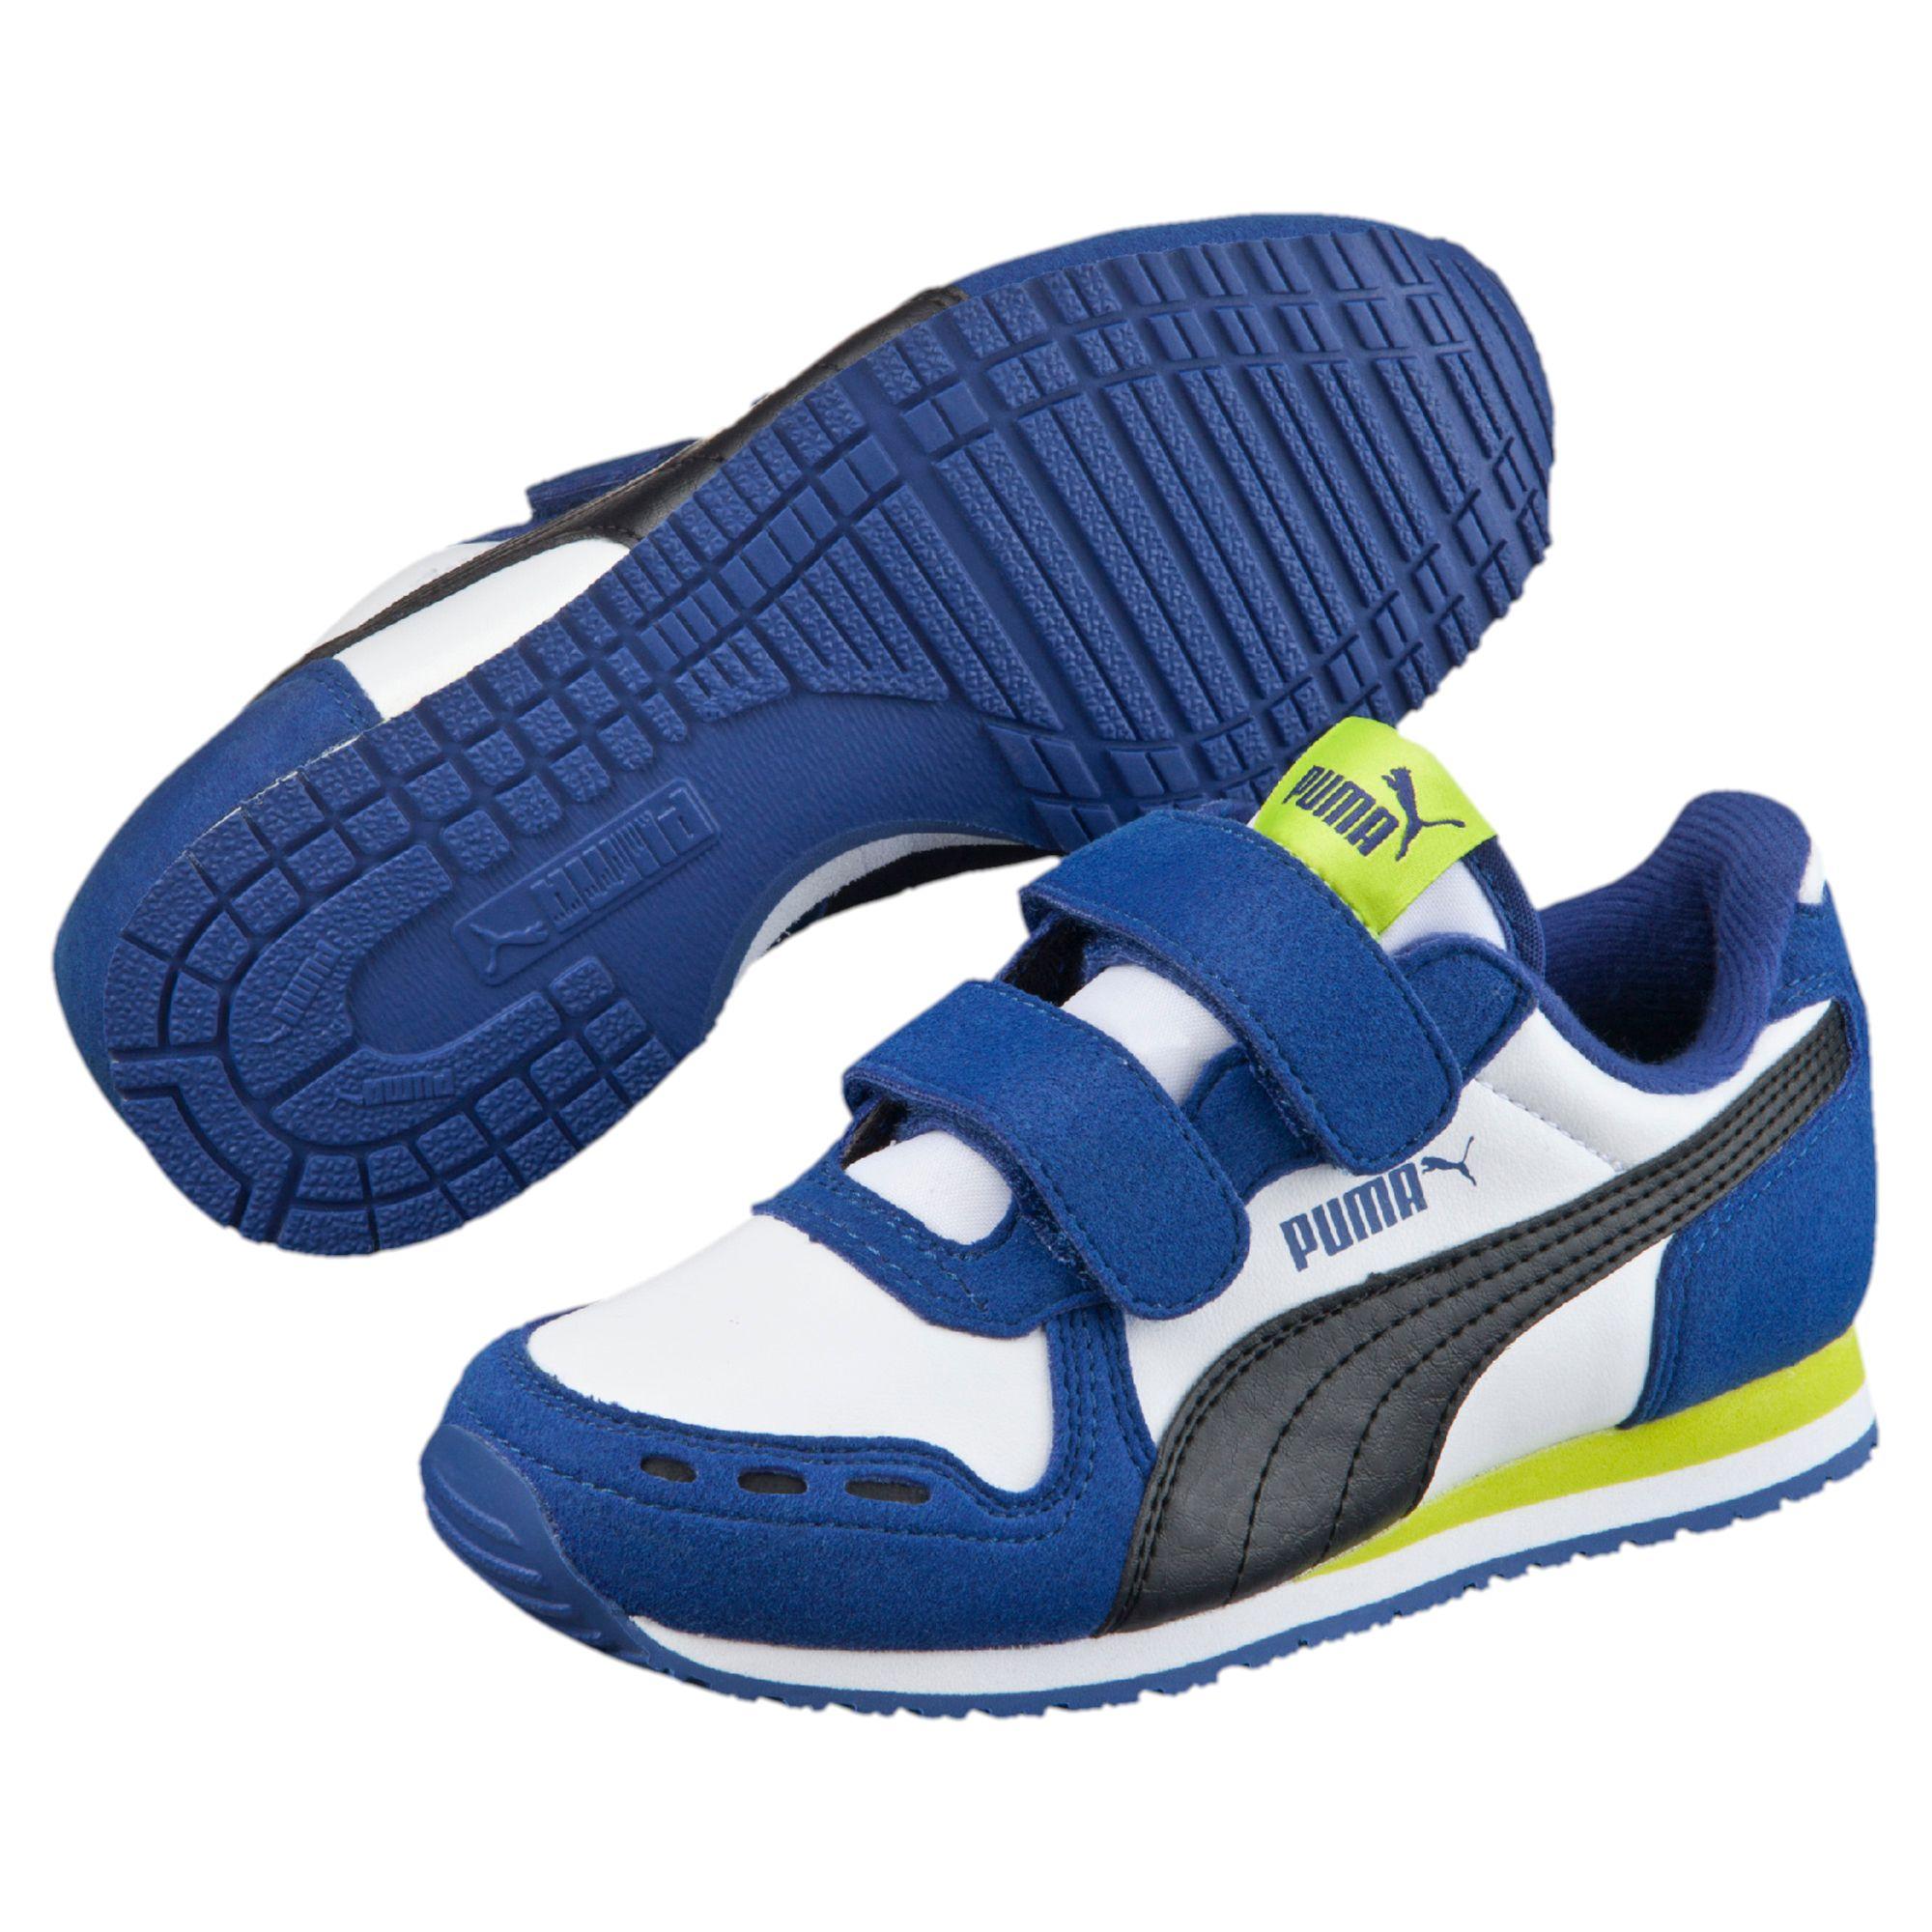 Pumas Cabana Coureur Sneaker V Ps Sl Enfants Unisexe - Blanc - 31 Eu vUcJF5D